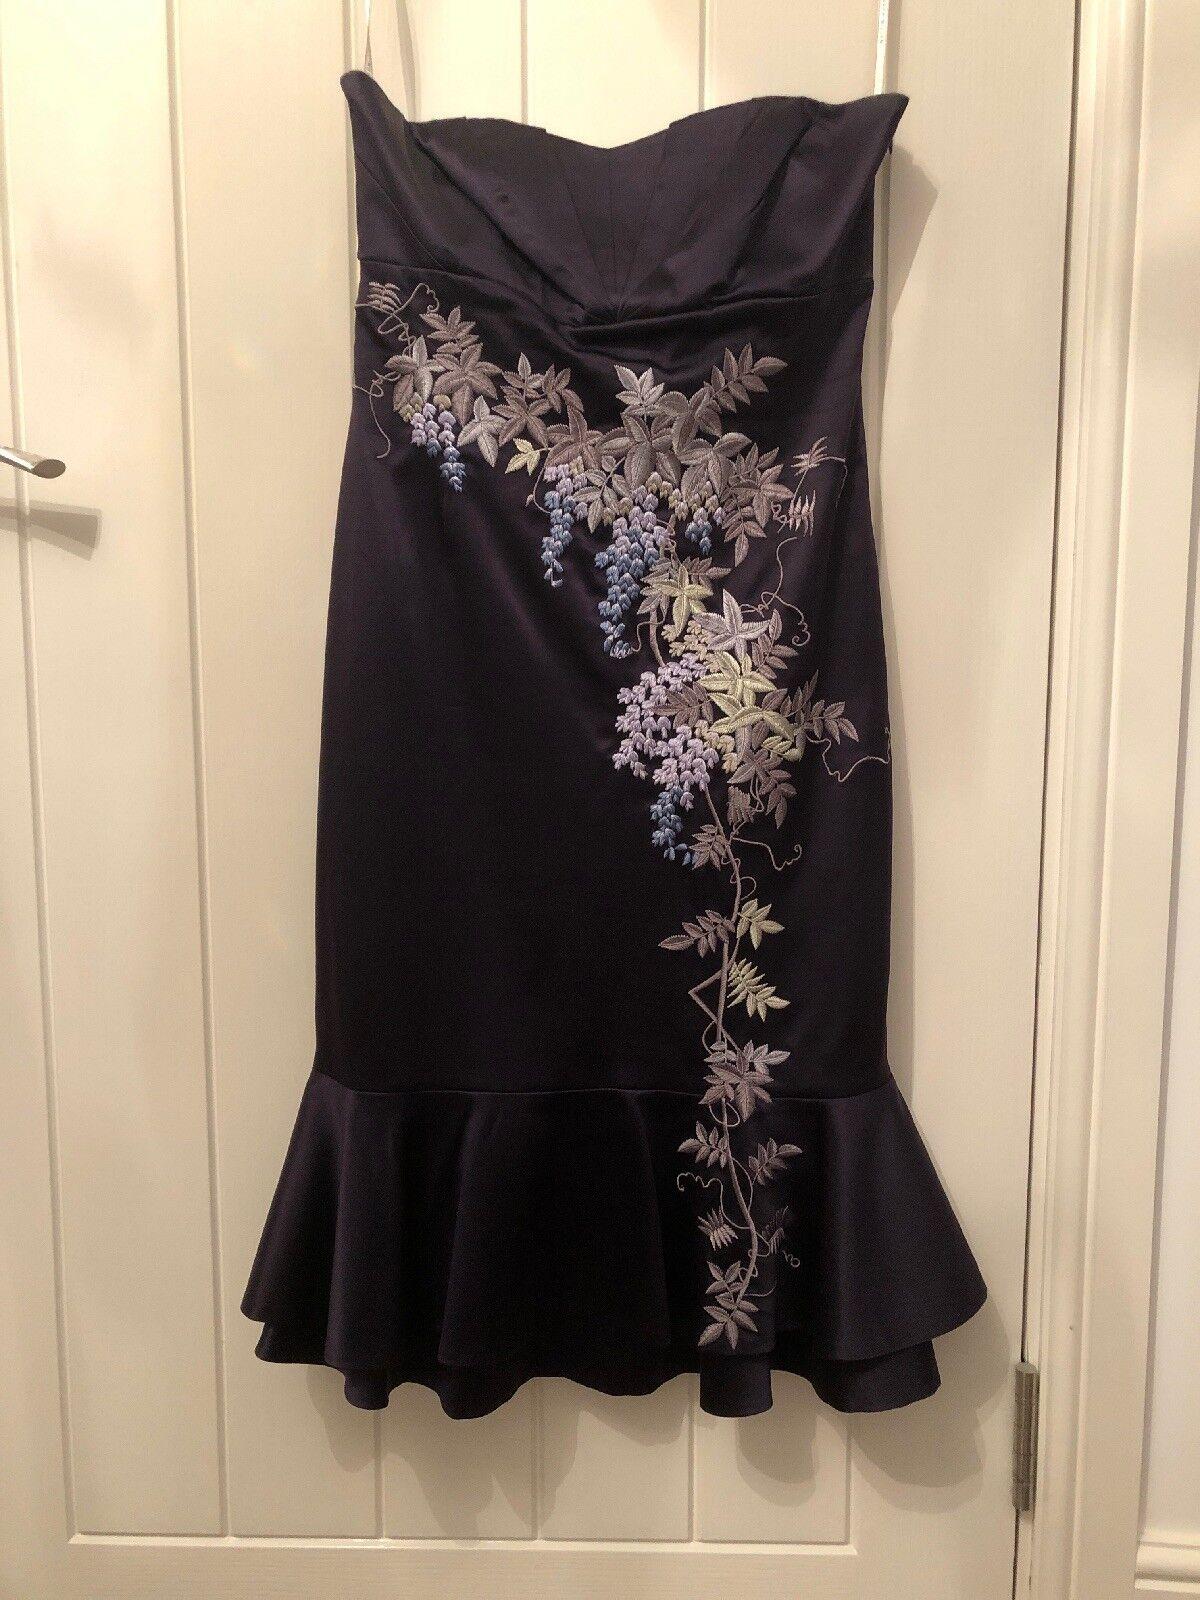 Splendido Karen Millen silk dress Dimensione 10 Festa Matrimonio Prom Palla